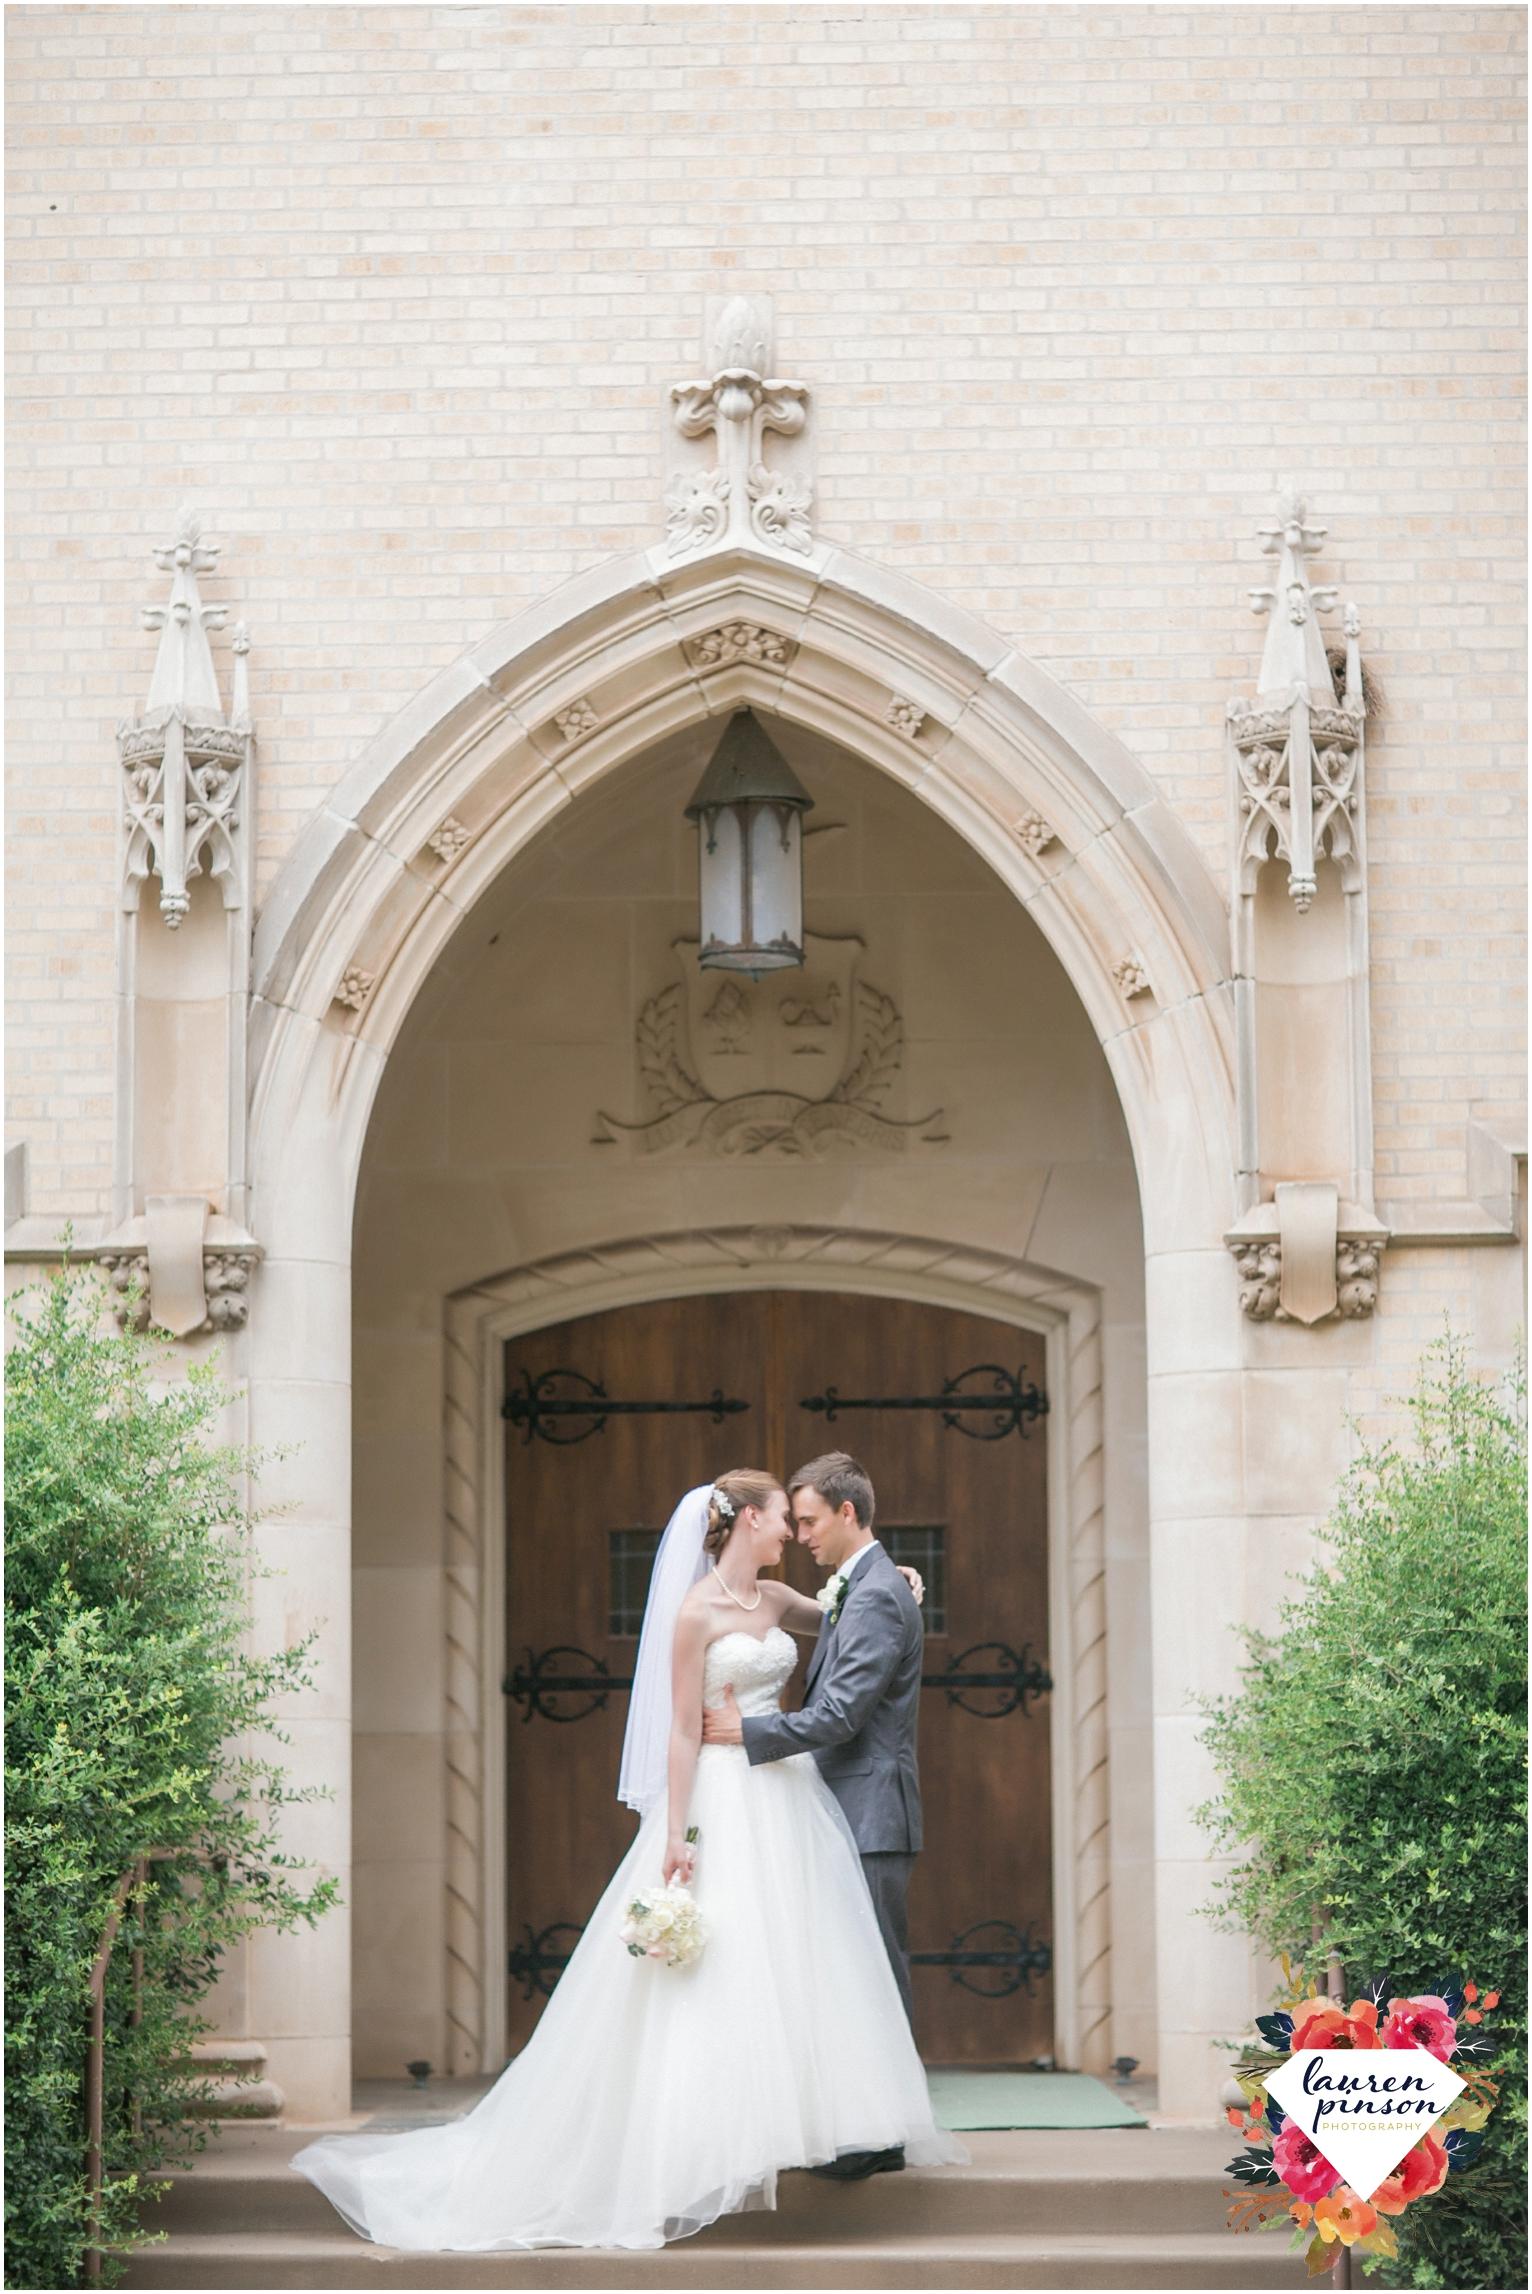 wichita-falls-wedding-photography-at-fain-presbyterian-church-and-the-wellington-timeless-classic-modern-photographer_1169.jpg